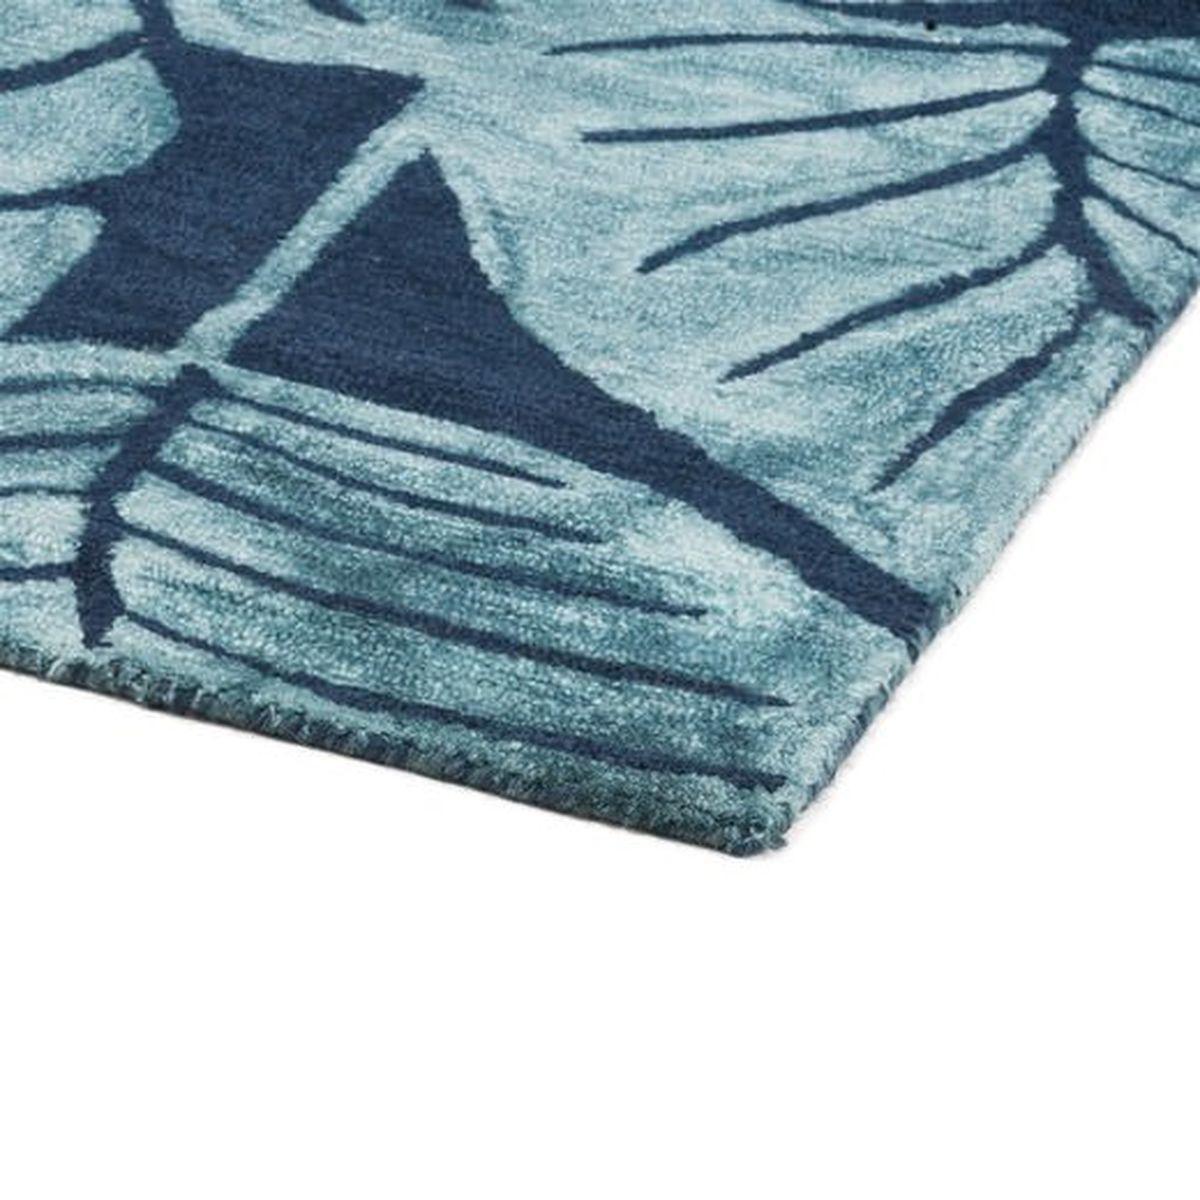 Tapis 160x230cm BLOOM Coco Maison anthracite